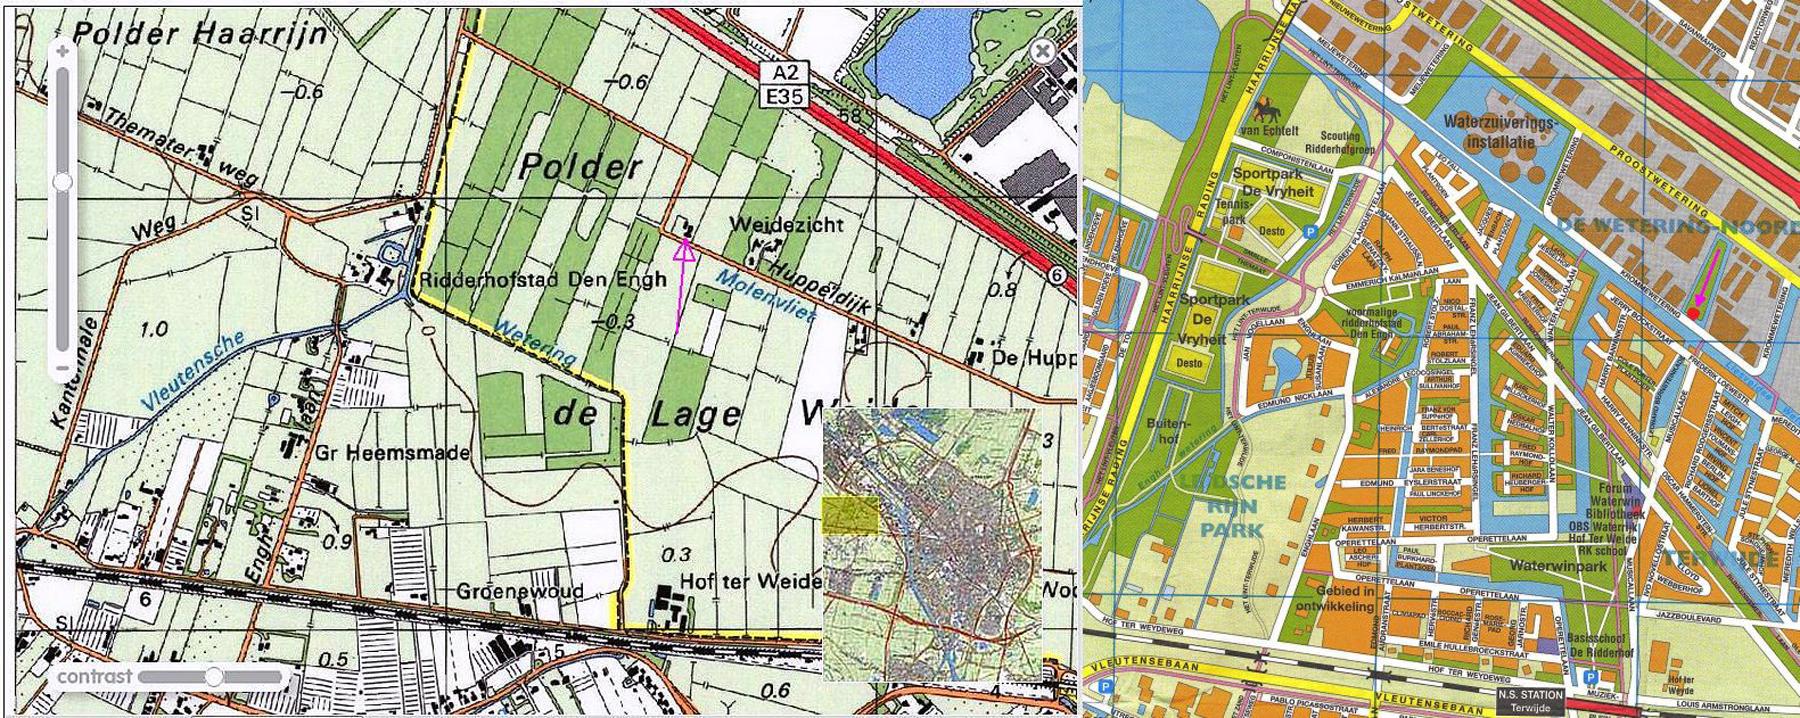 Panorama kaart Huppeldijk